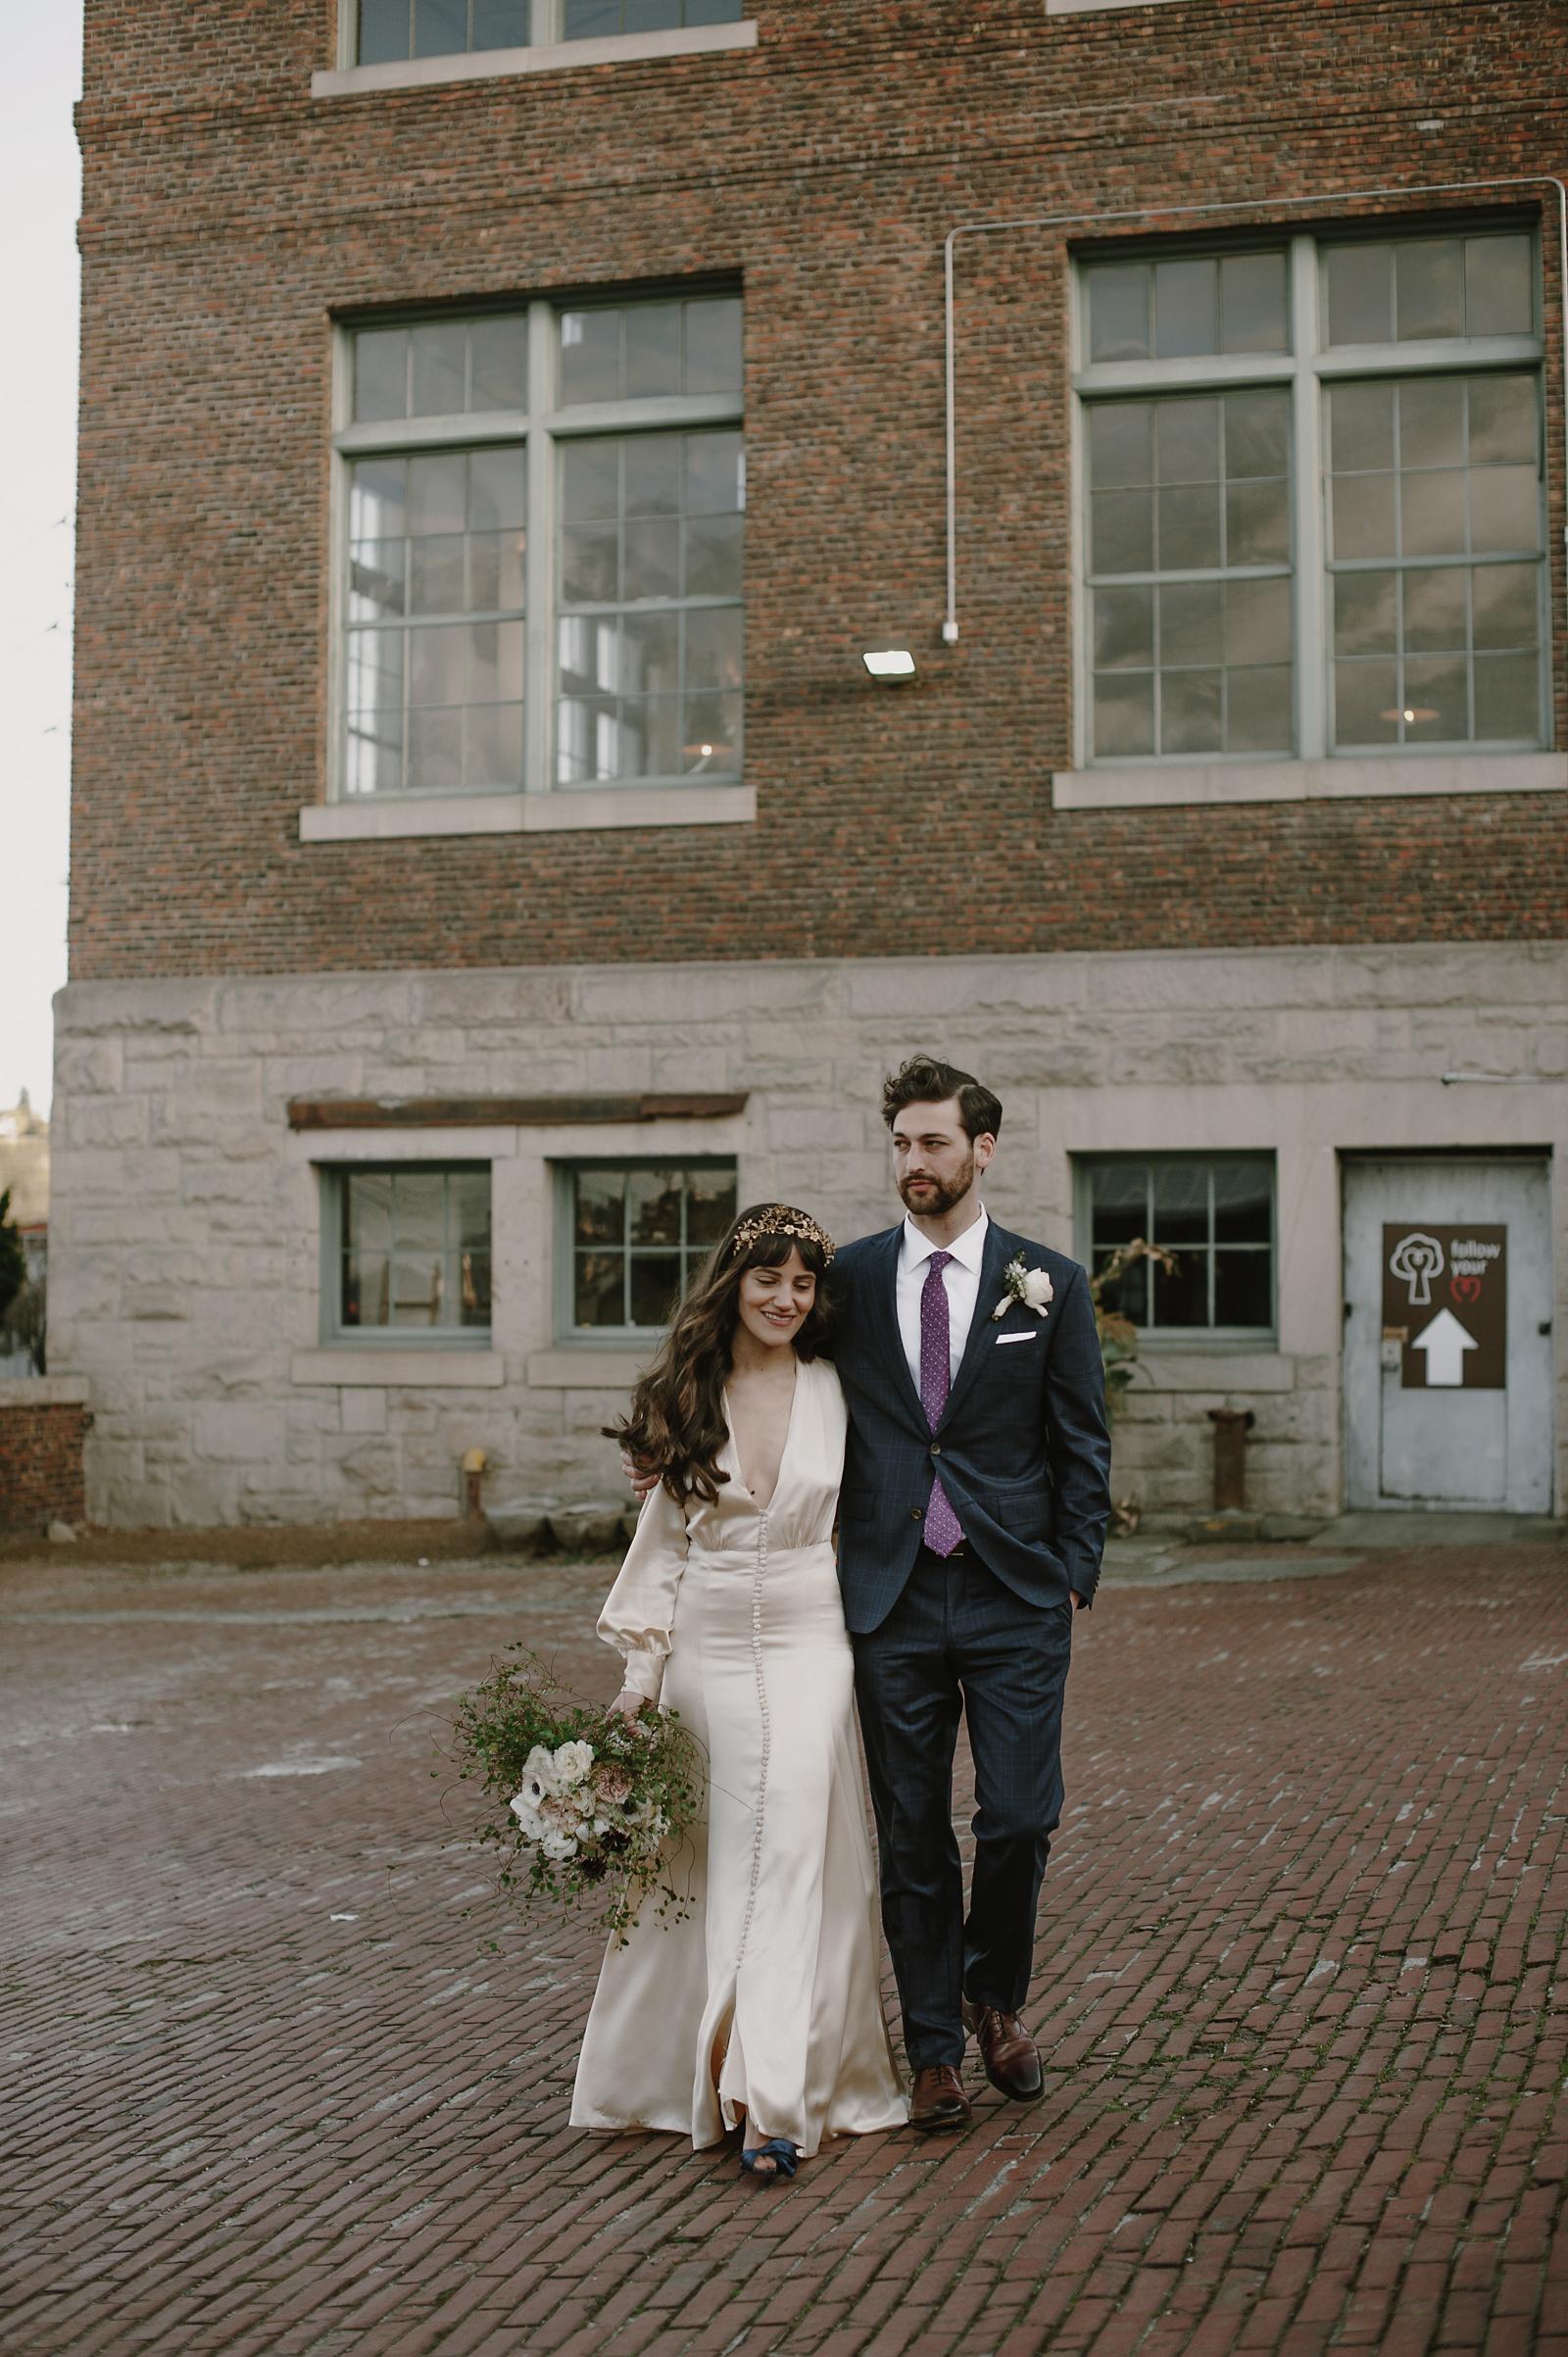 kristenmarieparker_tacoma_conservatory_warehouse_wedding077.JPG